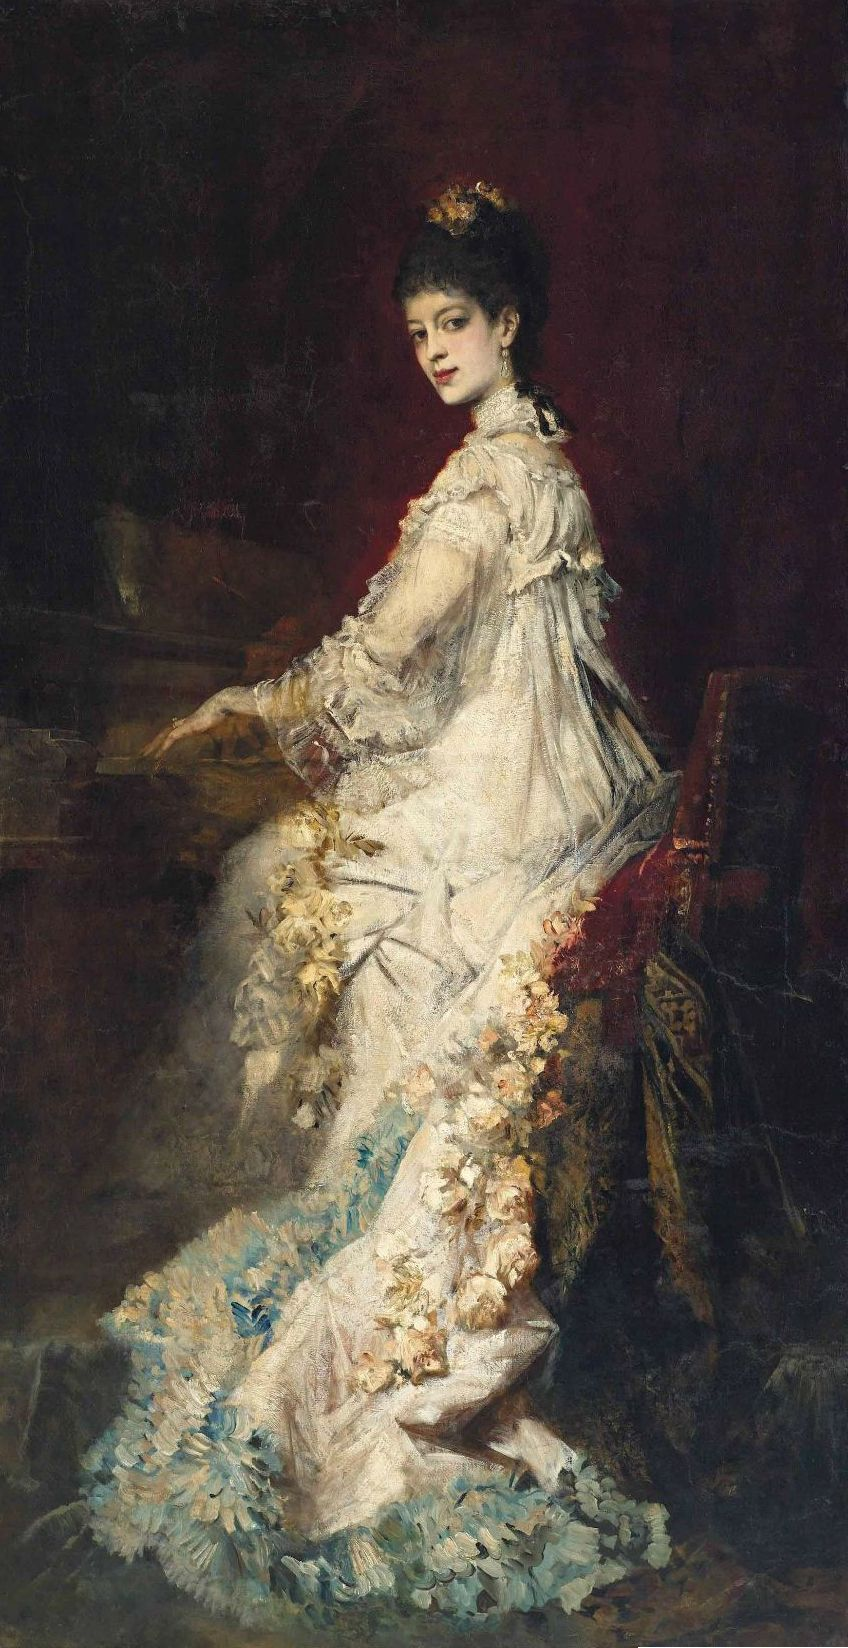 Maria Countess von Donhoff by Hans Makart (1840-1884)